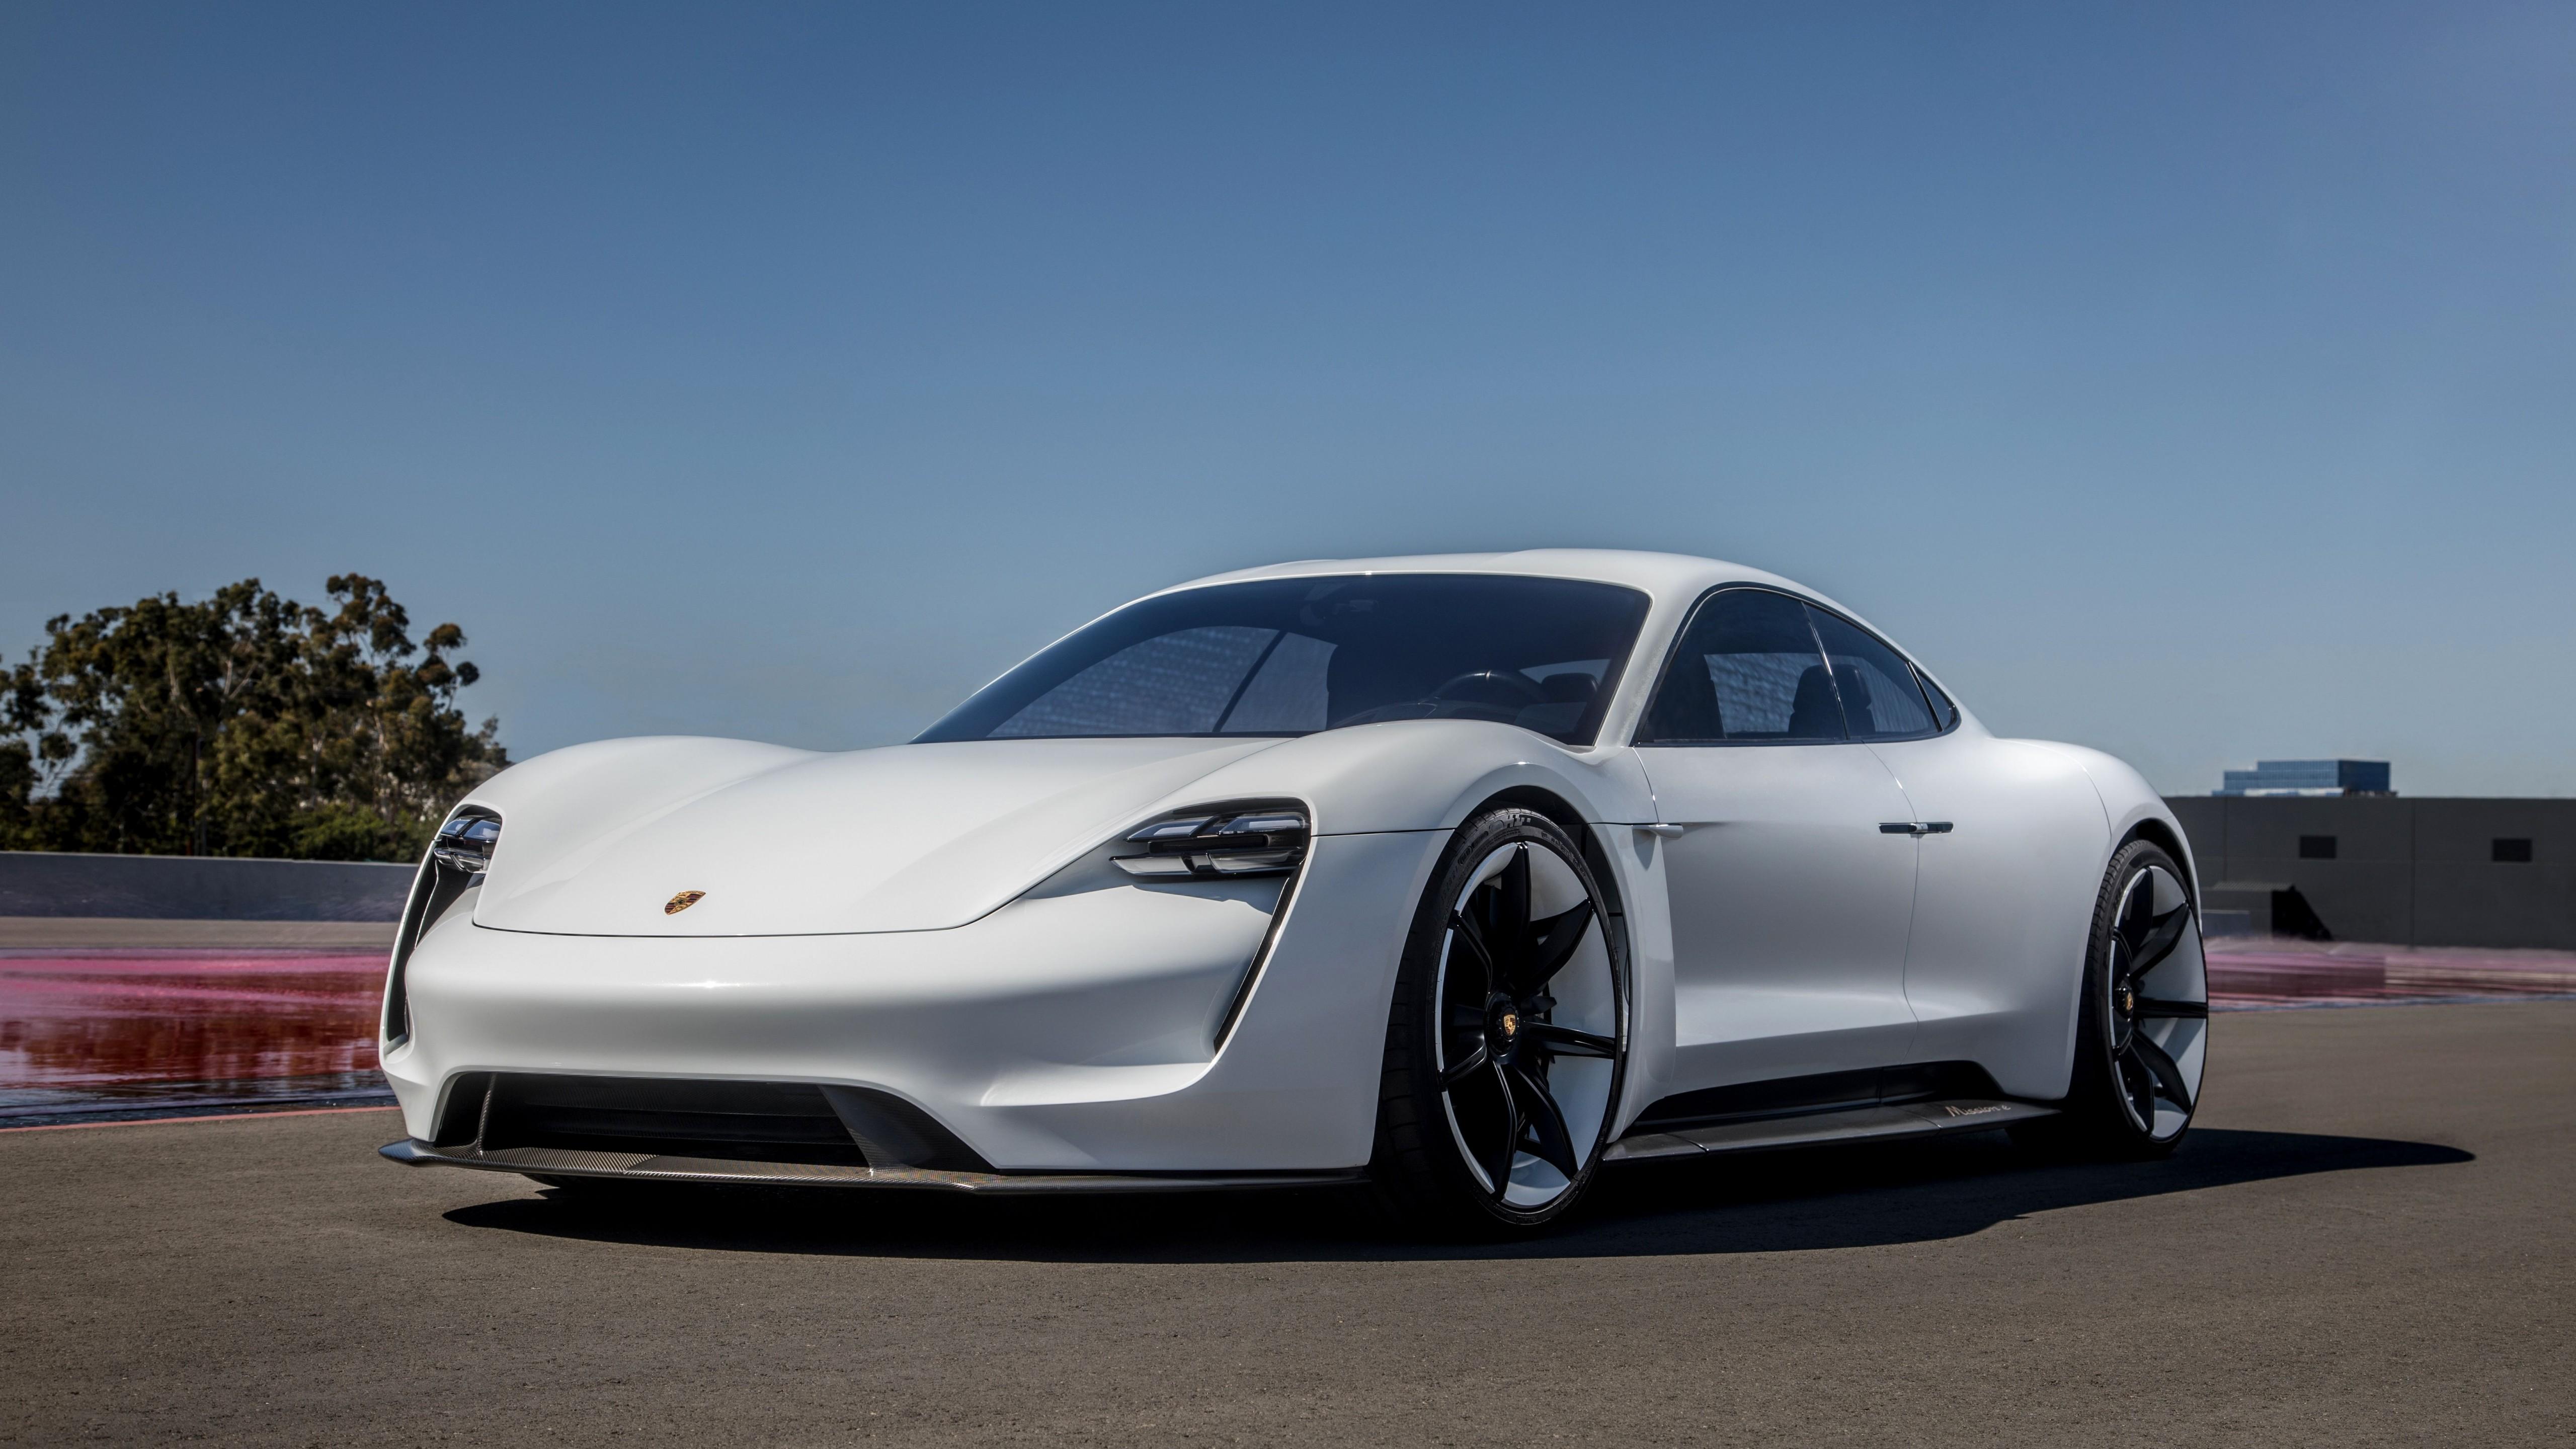 Wallpaper Porsche Taycan Electric Car supercar 2020 Cars 4K 5120x2880